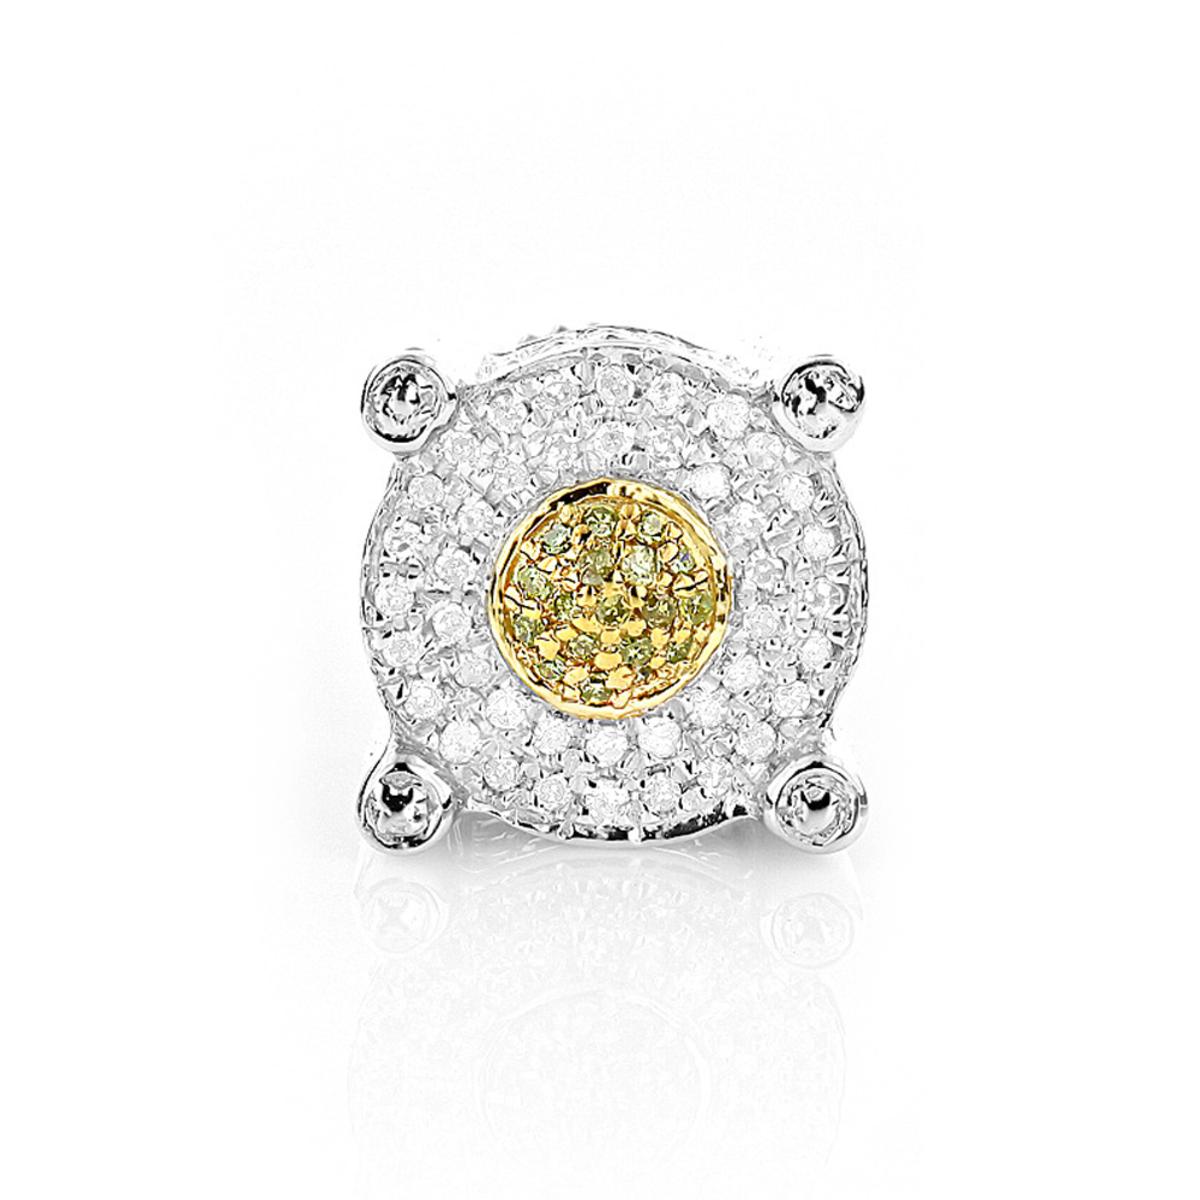 White and Yellow Diamond Earring 0.25ct Single Mens Stud